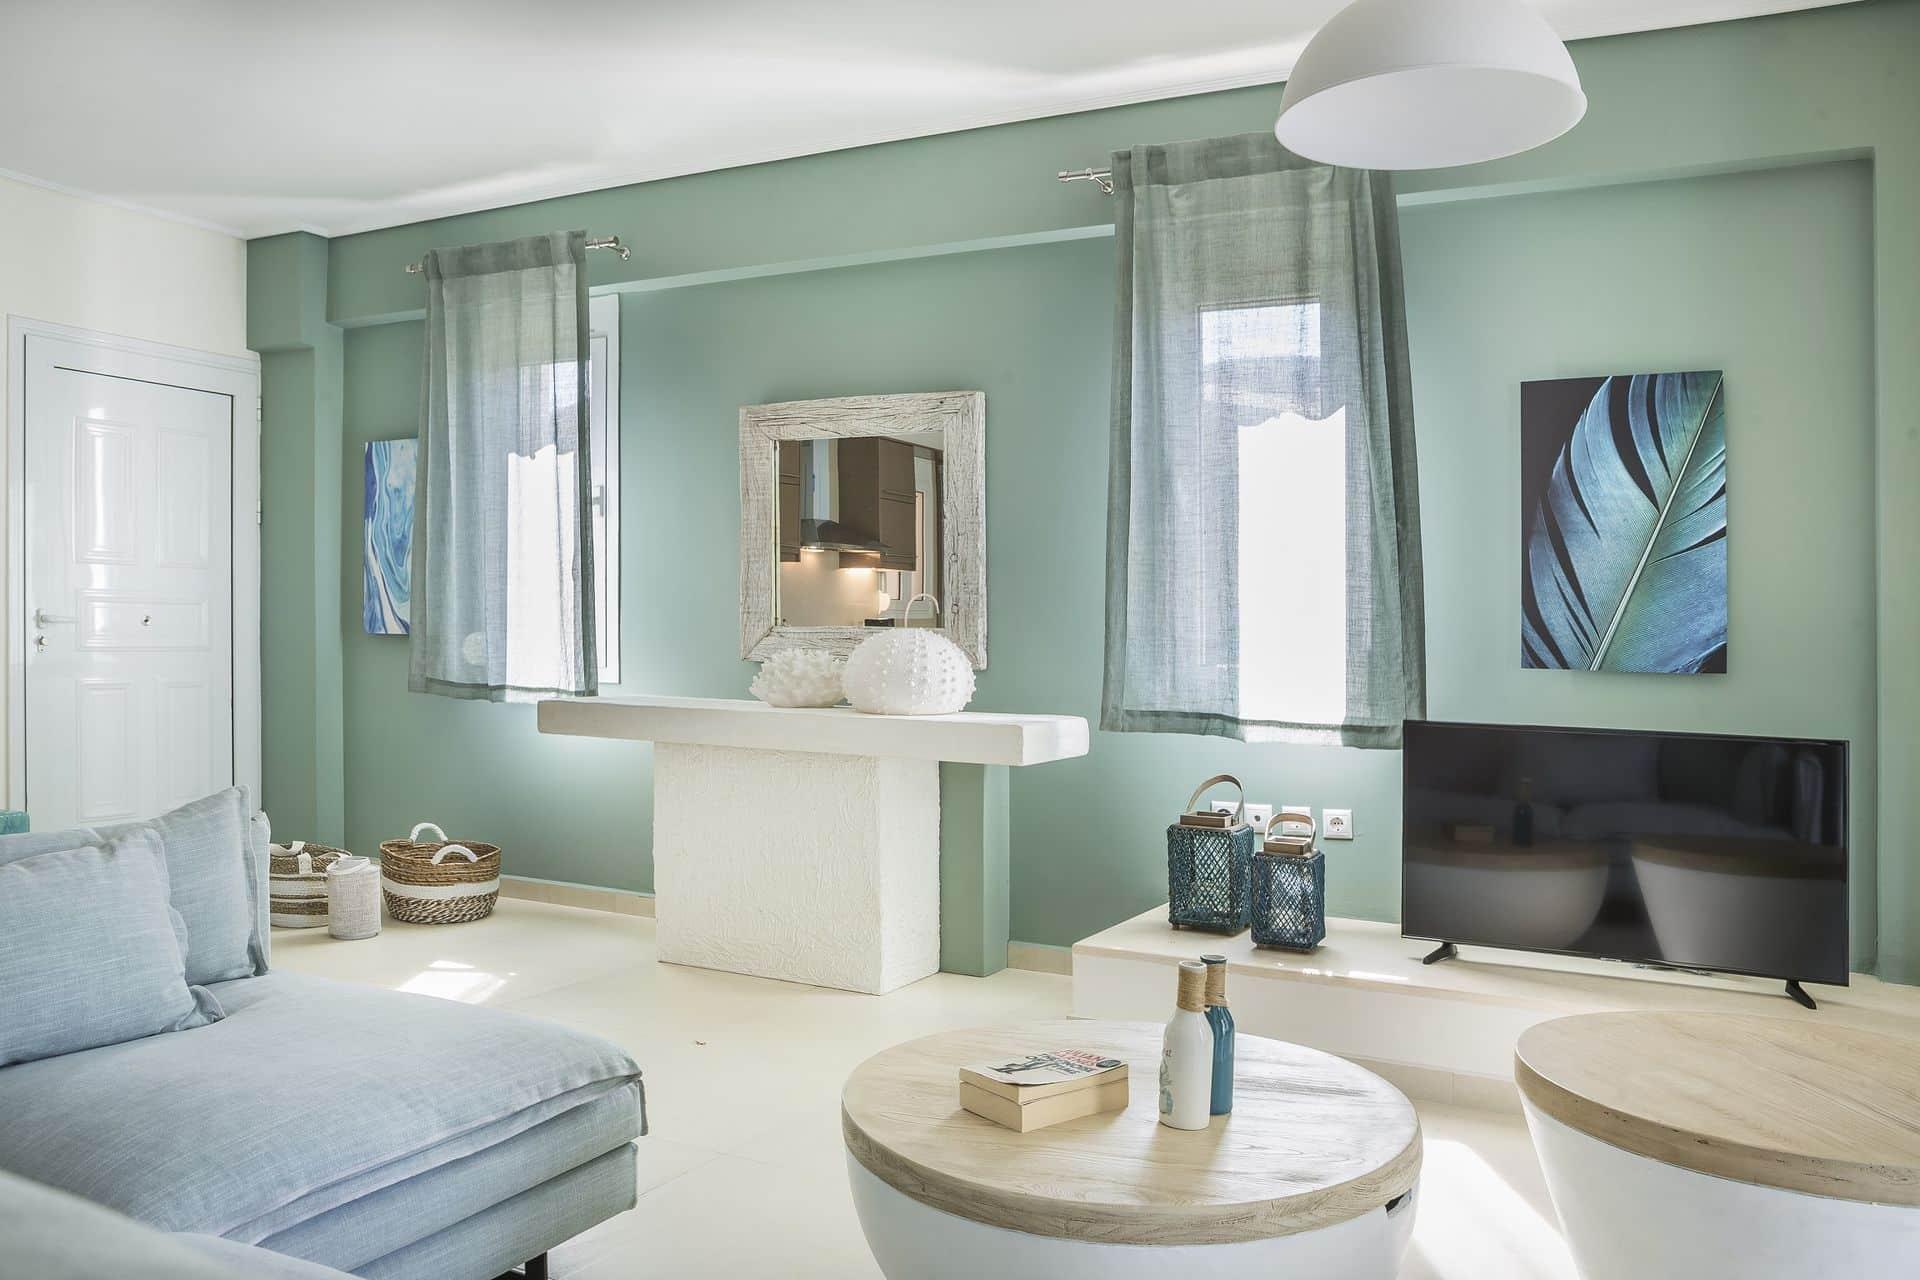 kefalonia luxury apartments